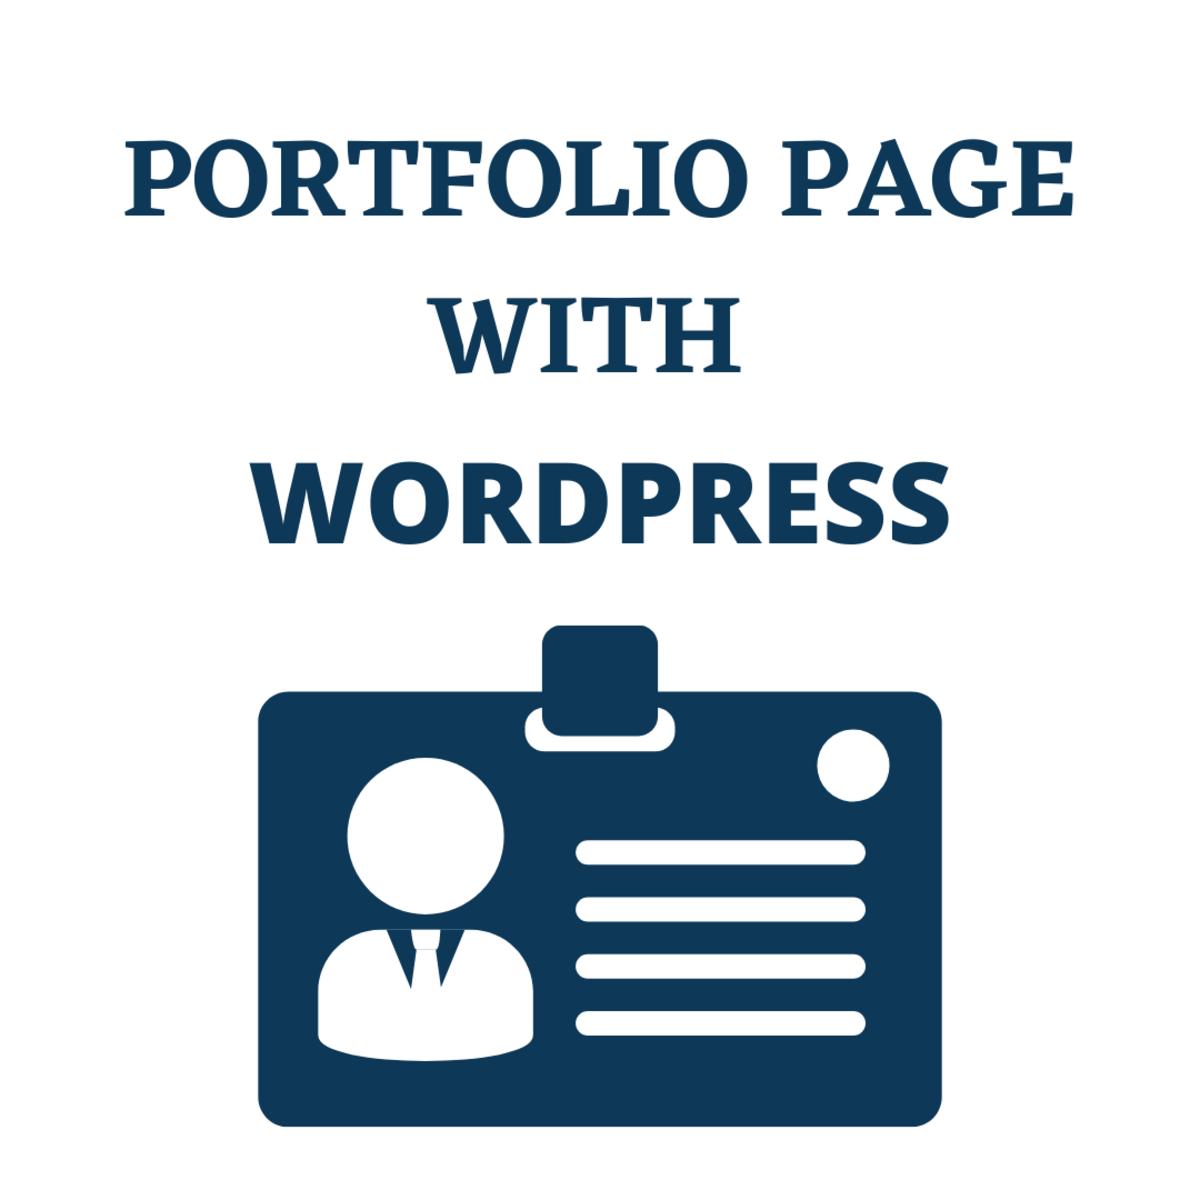 how-to-create-a-portfolio-page-with-wordpress